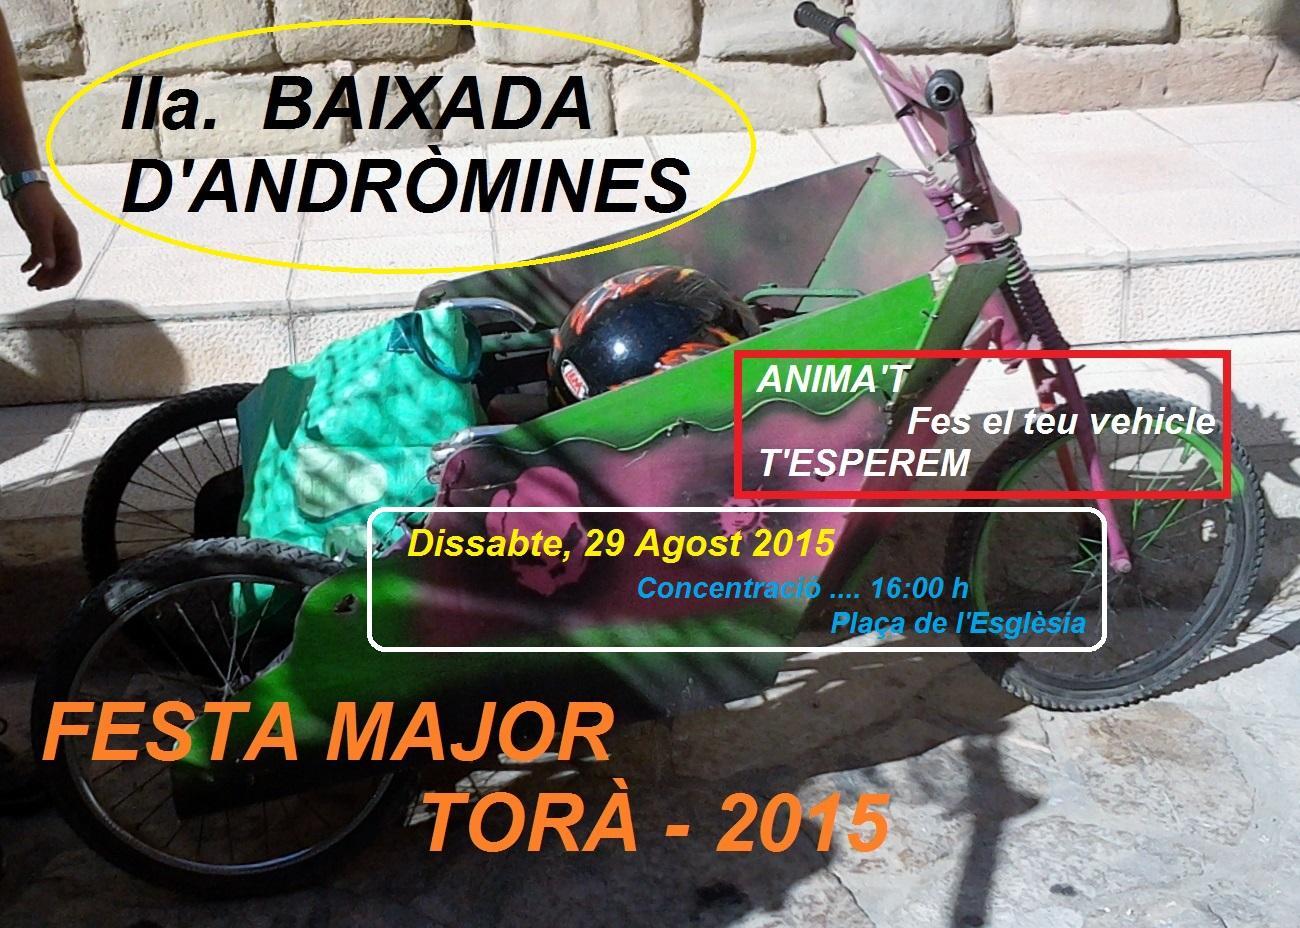 cartell II Baixada andròmines